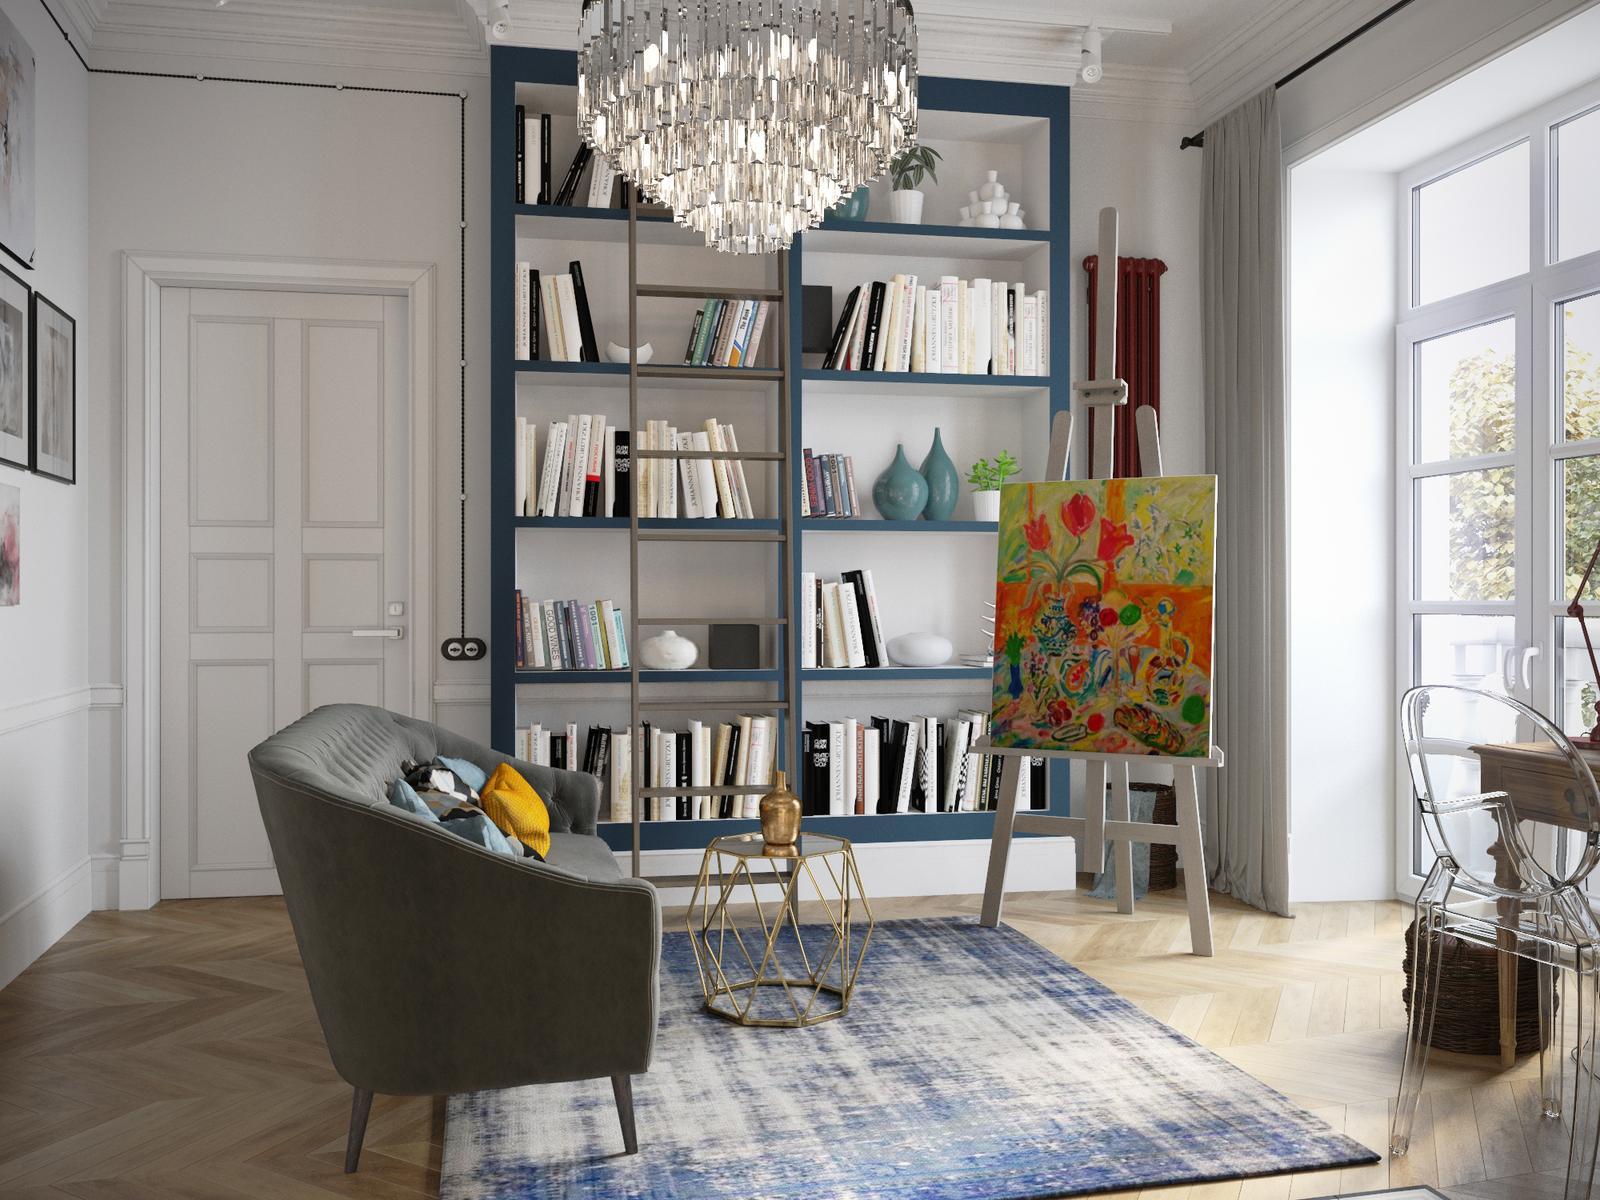 fbc5b3f0ea1c8fd - Идеи интерьера трехкомнатной квартиры